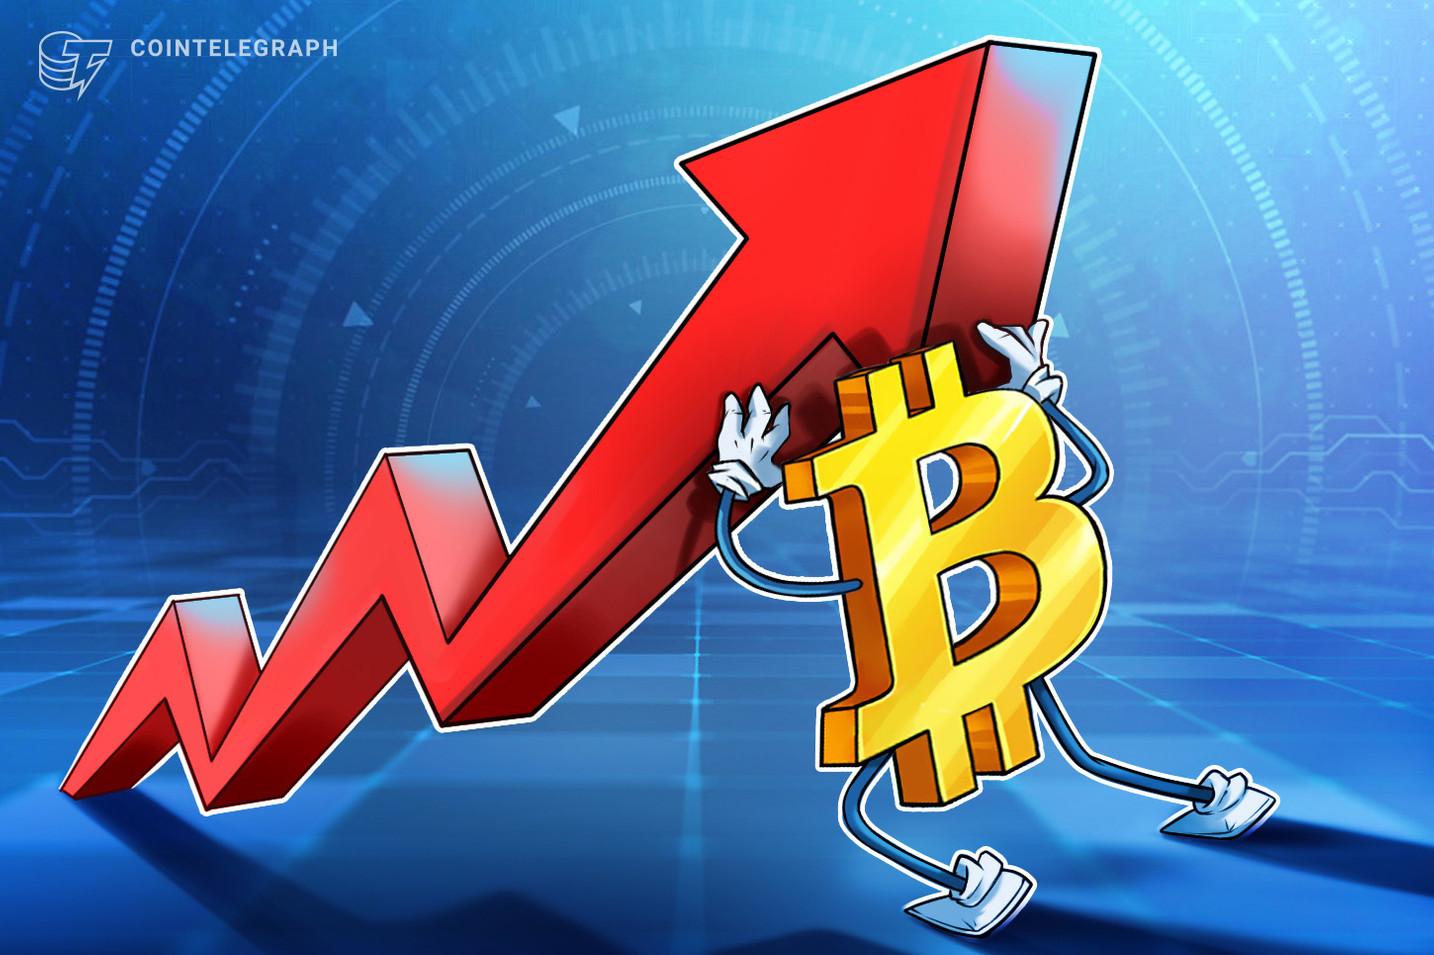 Bitcoin sieht den zweitlängsten Rückgang des Bullenmarktes, wobei der BTC-Preis bei 30 $ feststeckt